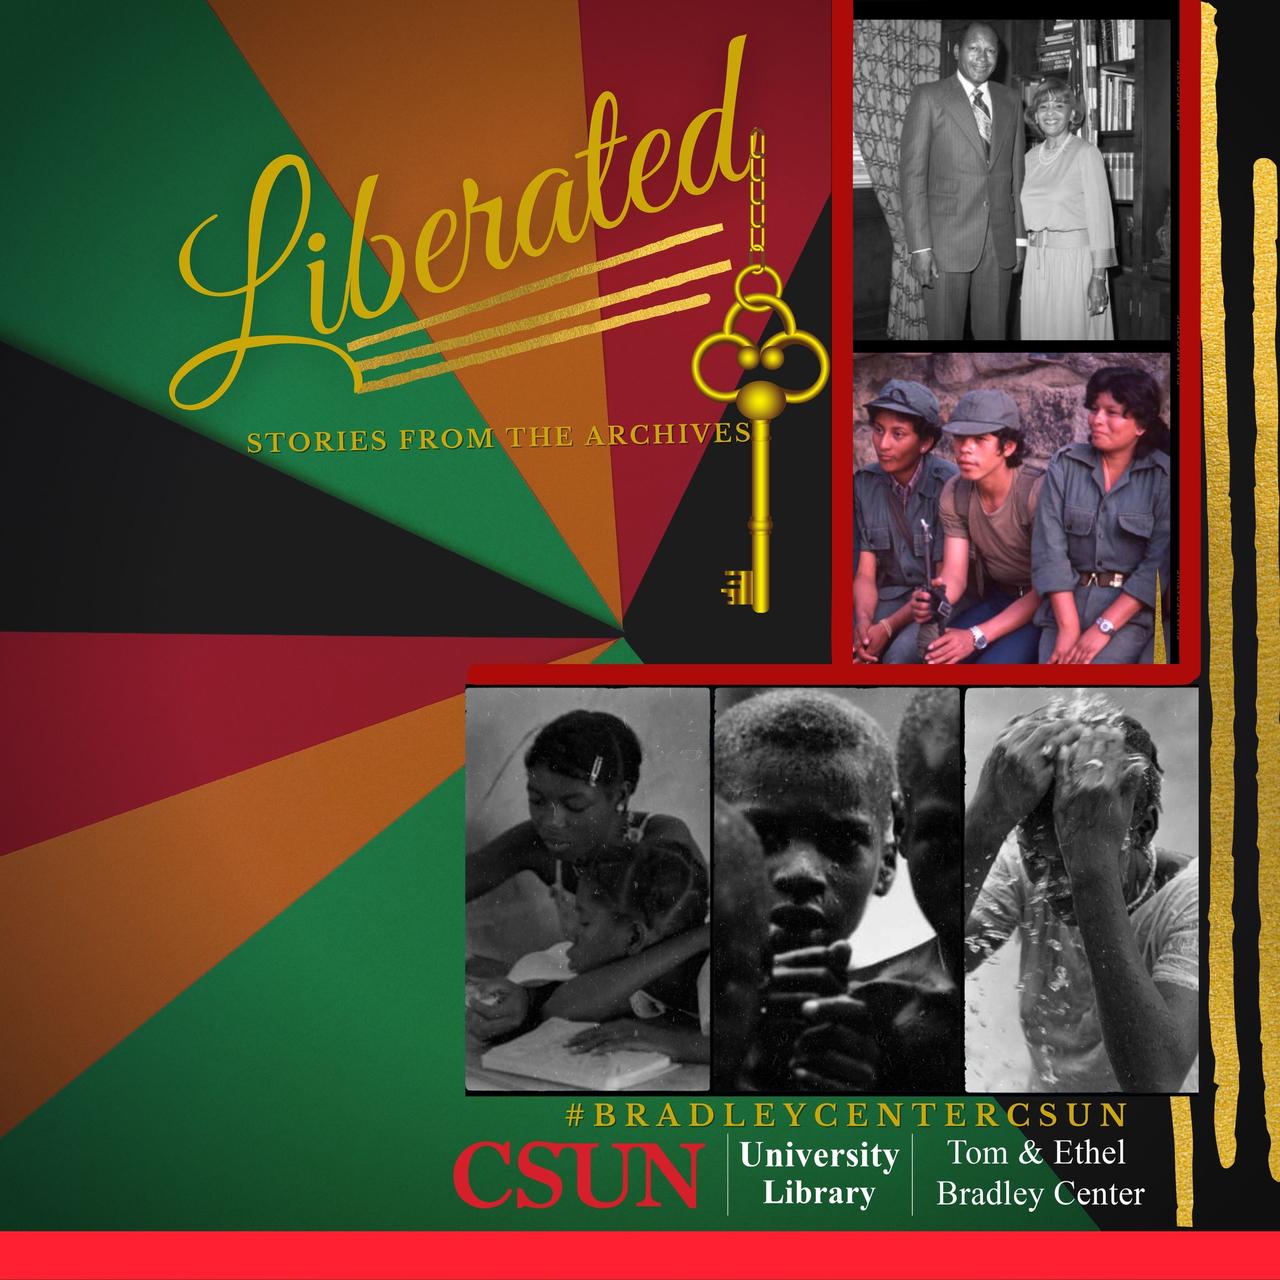 Liberated | Bradley Center CSUN